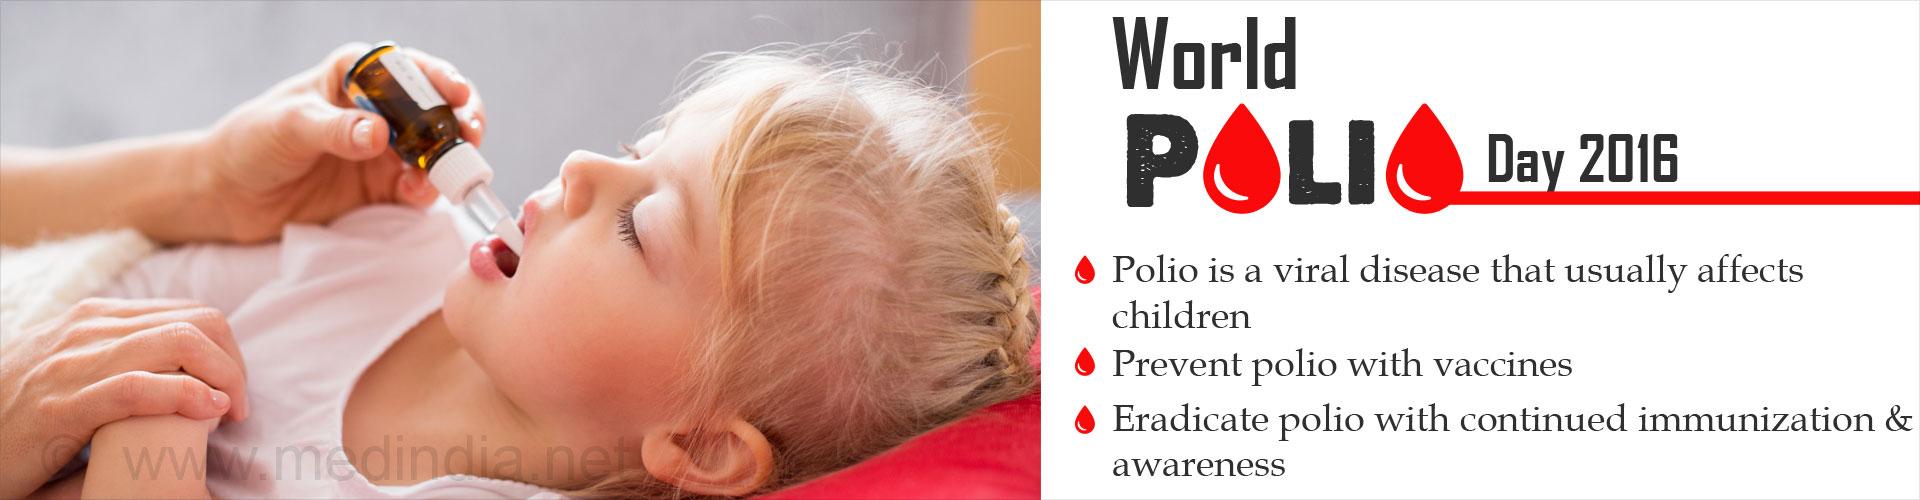 World Polio Day 2016: 'End Polio'